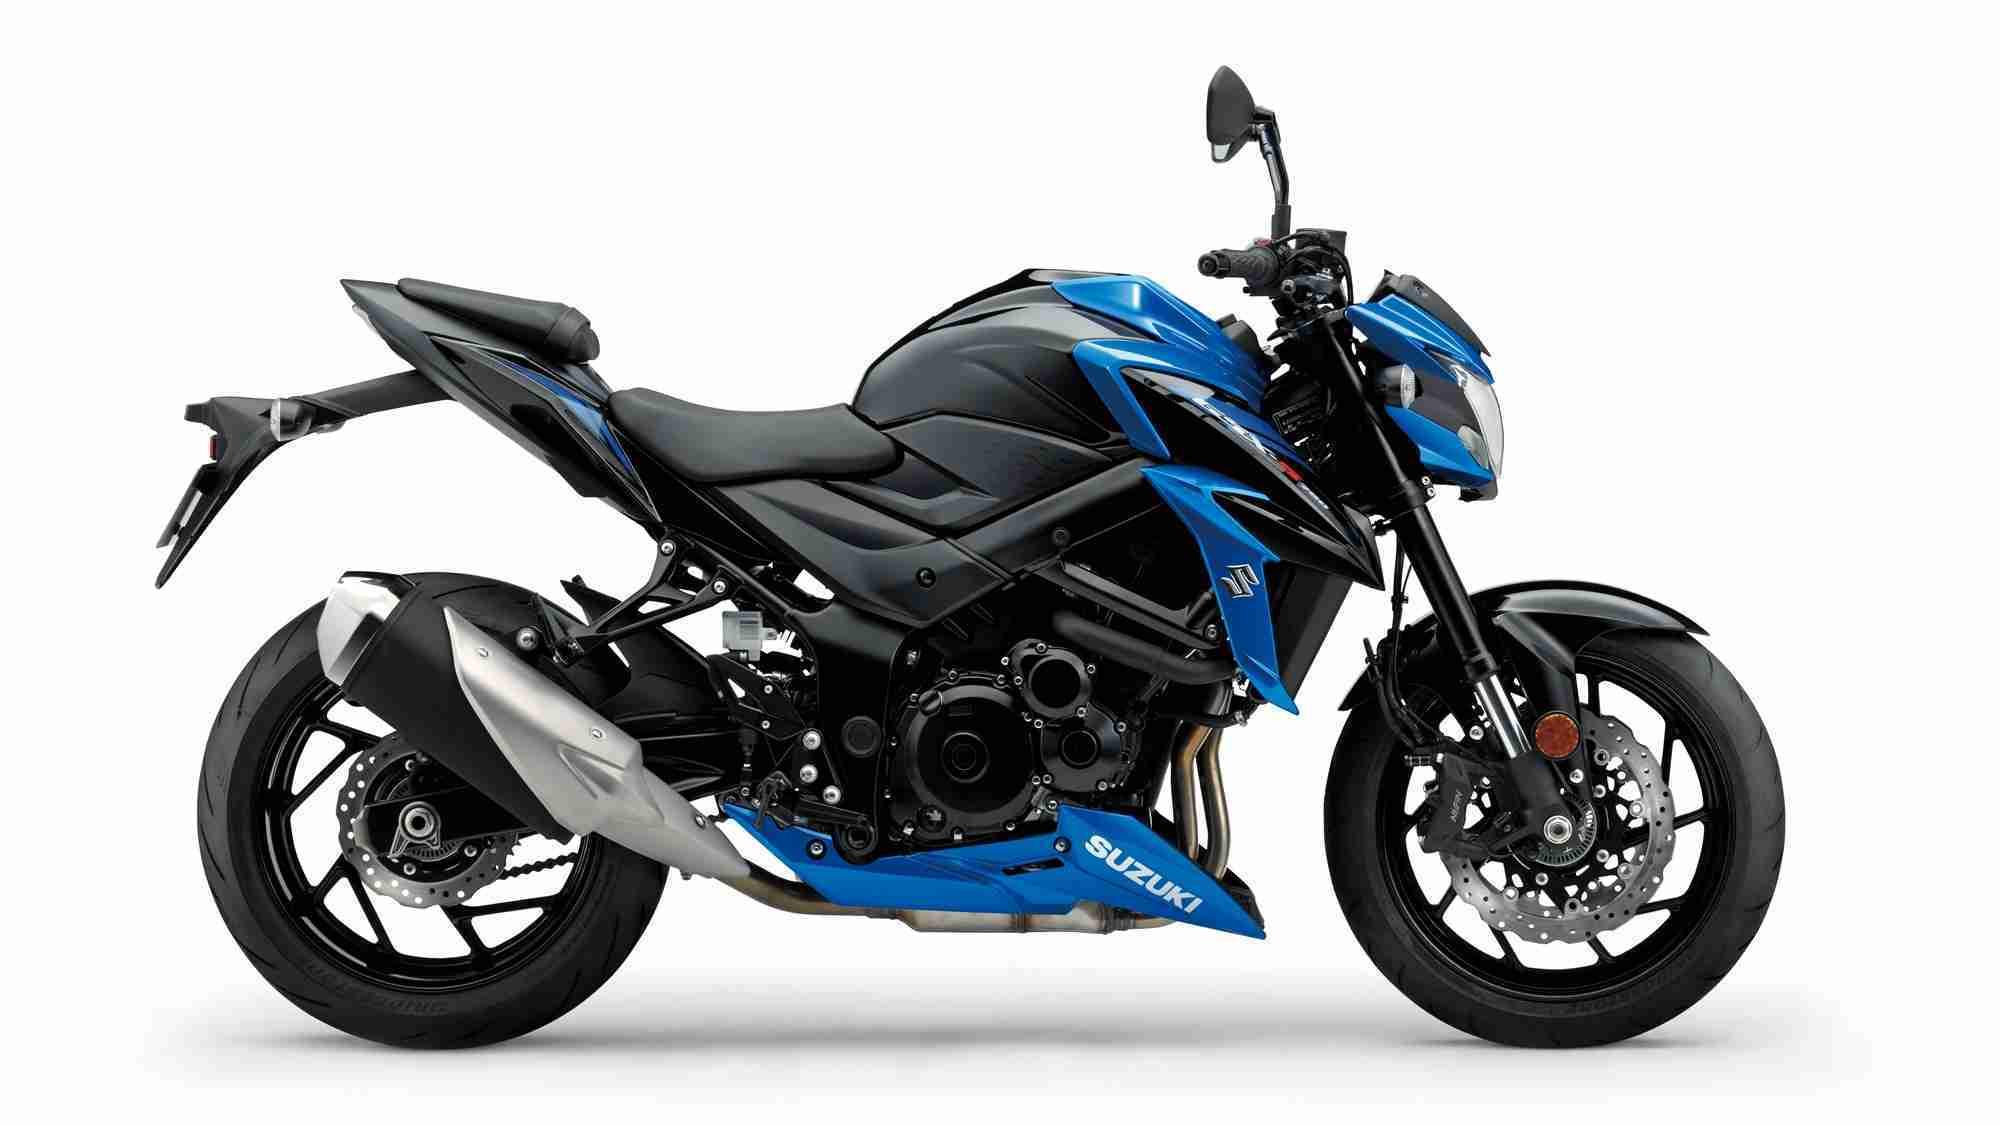 Suzuki GSX-S750 Blue colour option